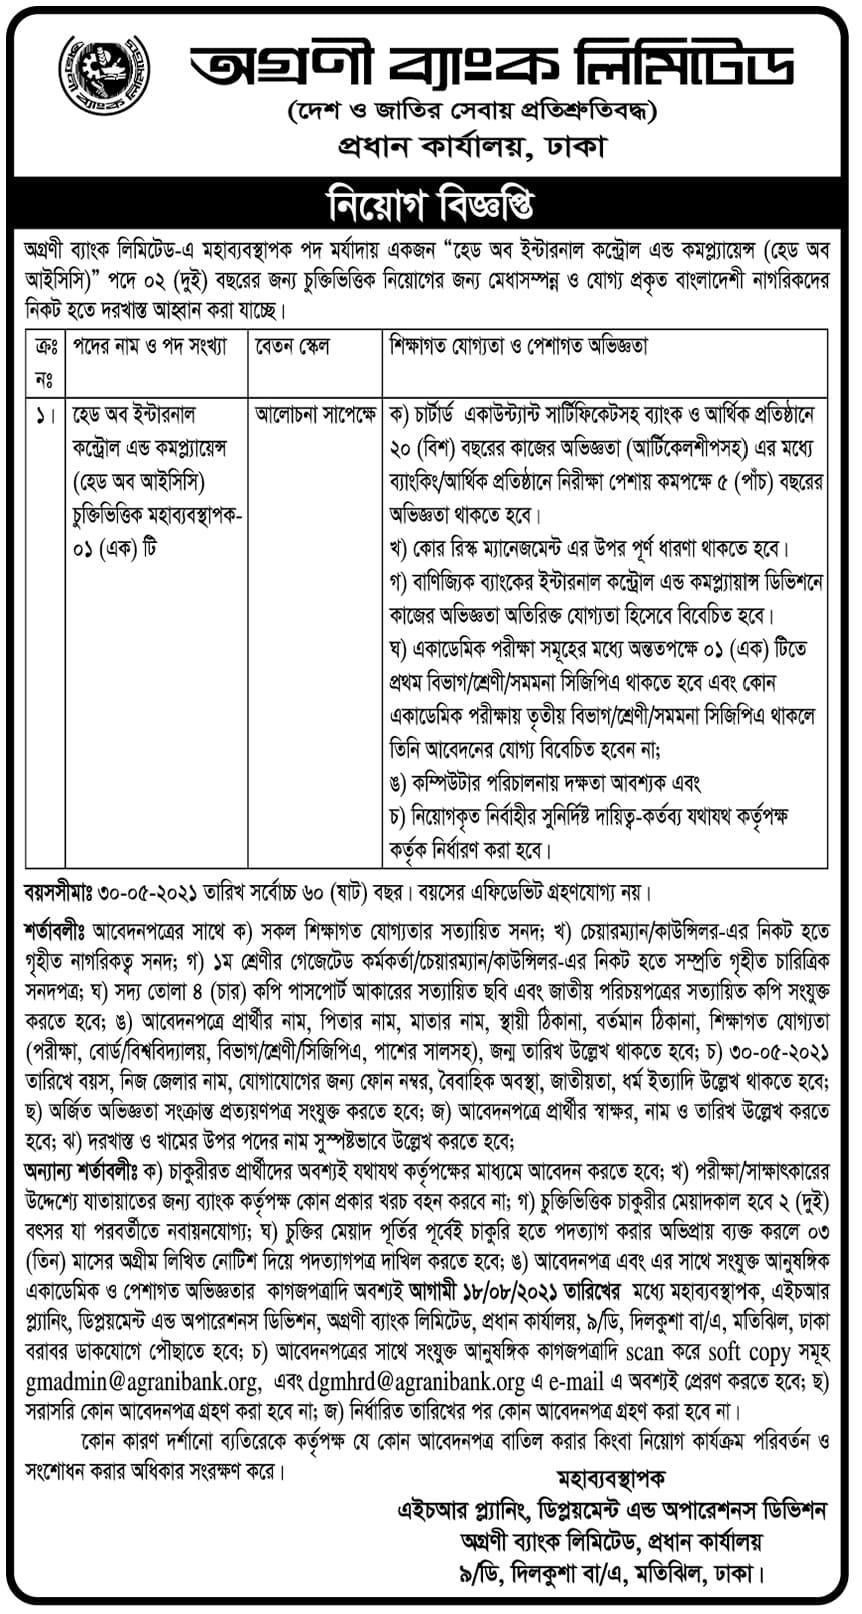 Agrani Bank Ltd Job Circular 2021